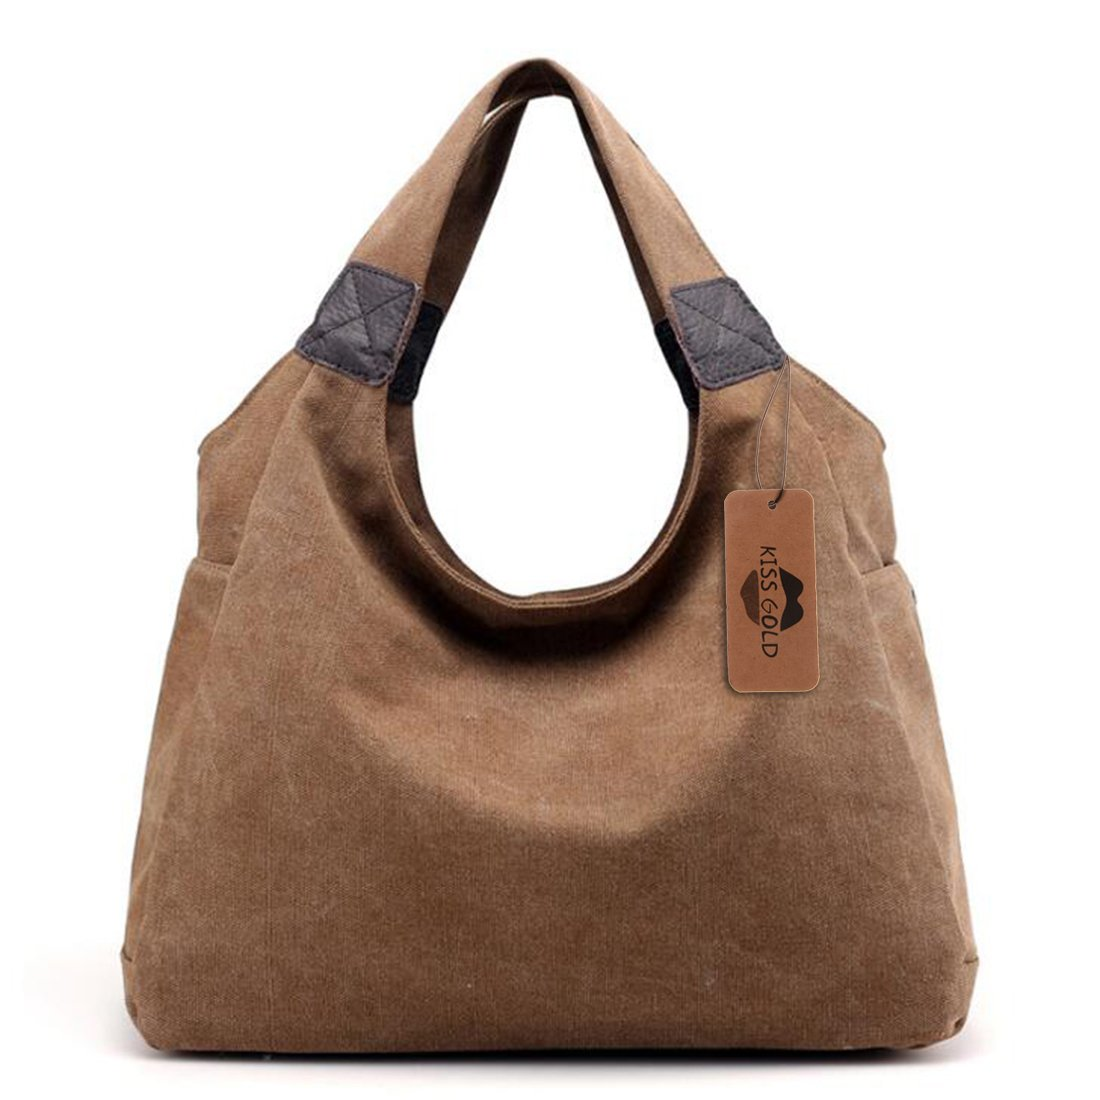 KISS GOLD(TM) Simple Style Canvas Tote Hobo Bag Shopper Handbag For Womens, Model B-Brown